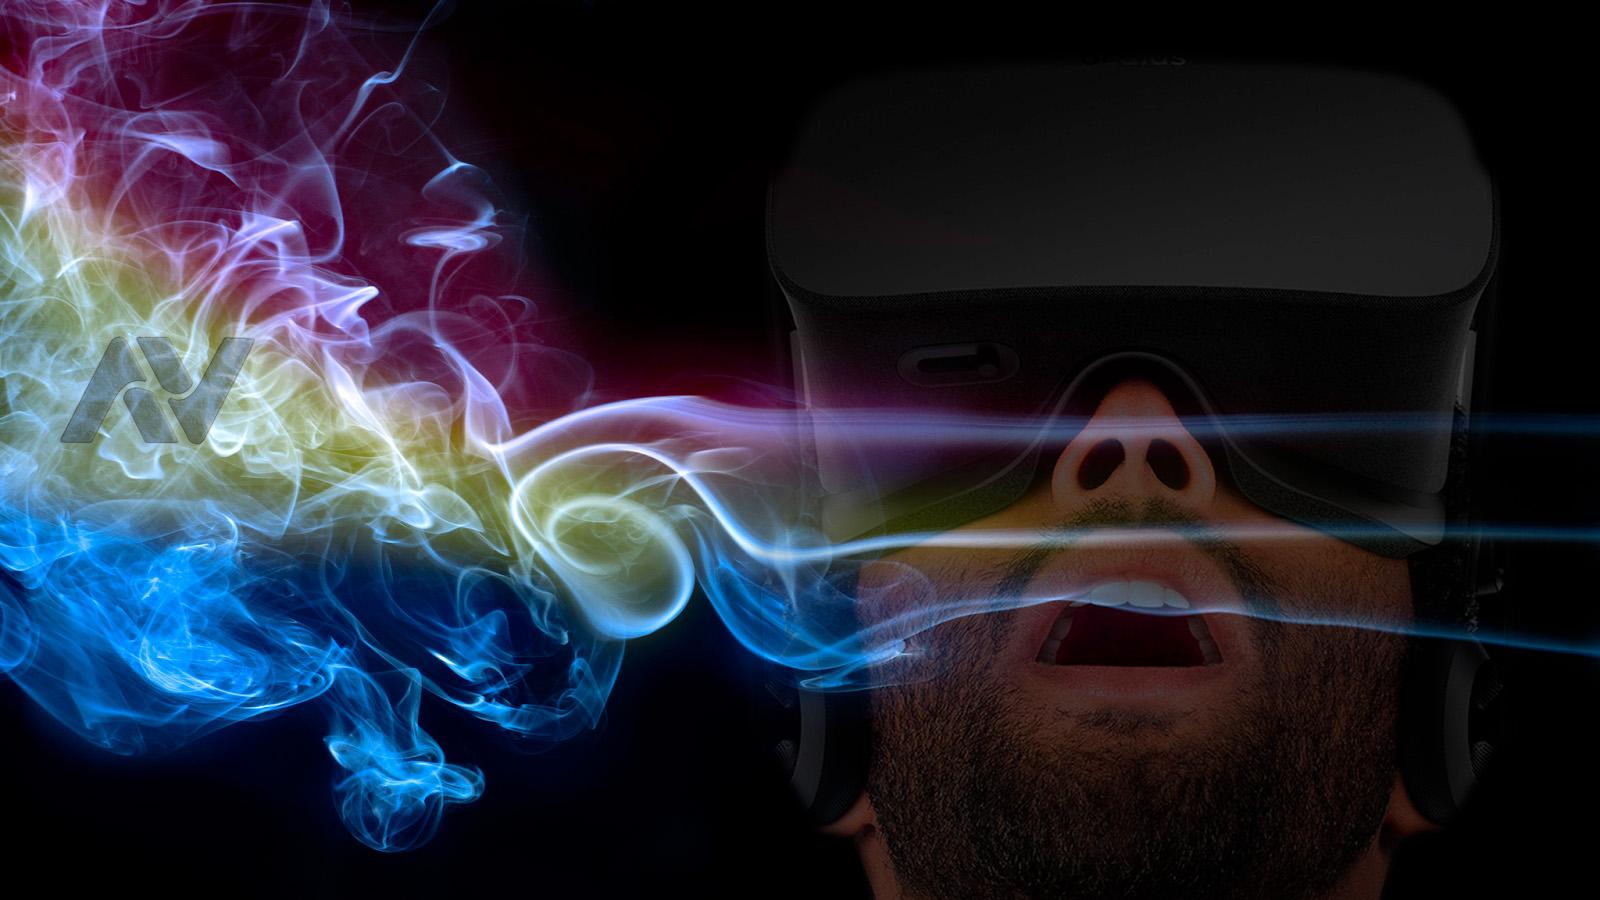 Digital Scent Technology - Smell, Taste, Feel Via Internet |